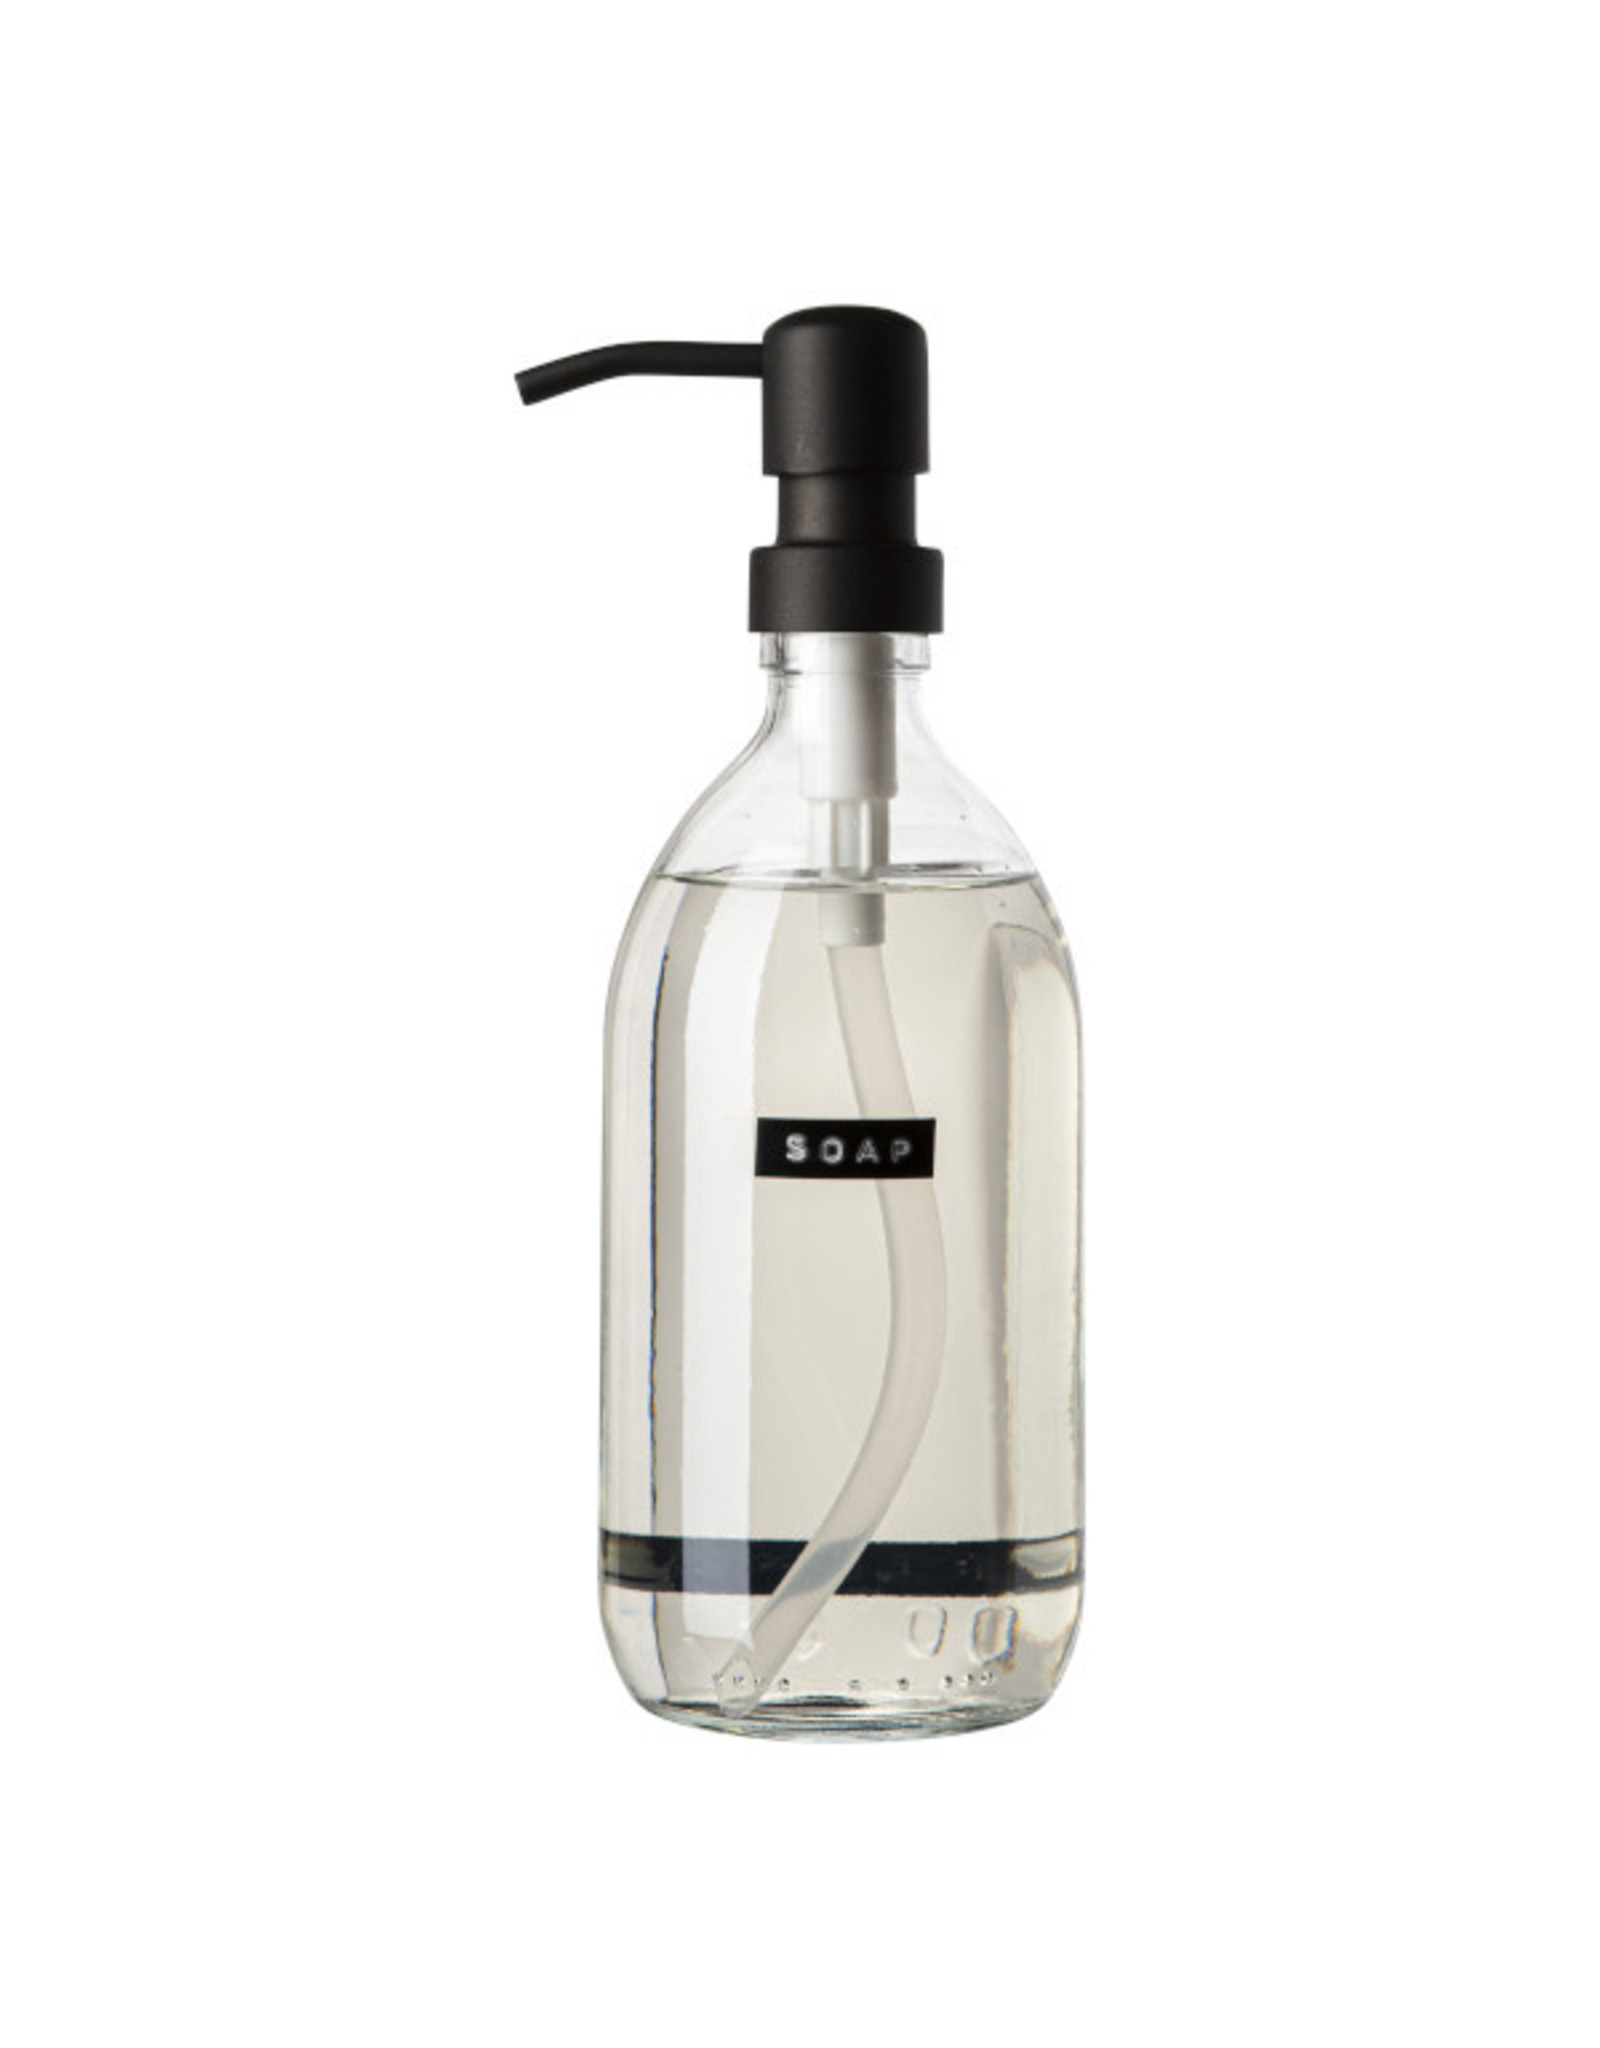 Zeeppomp glas black 500ml 'Soap'